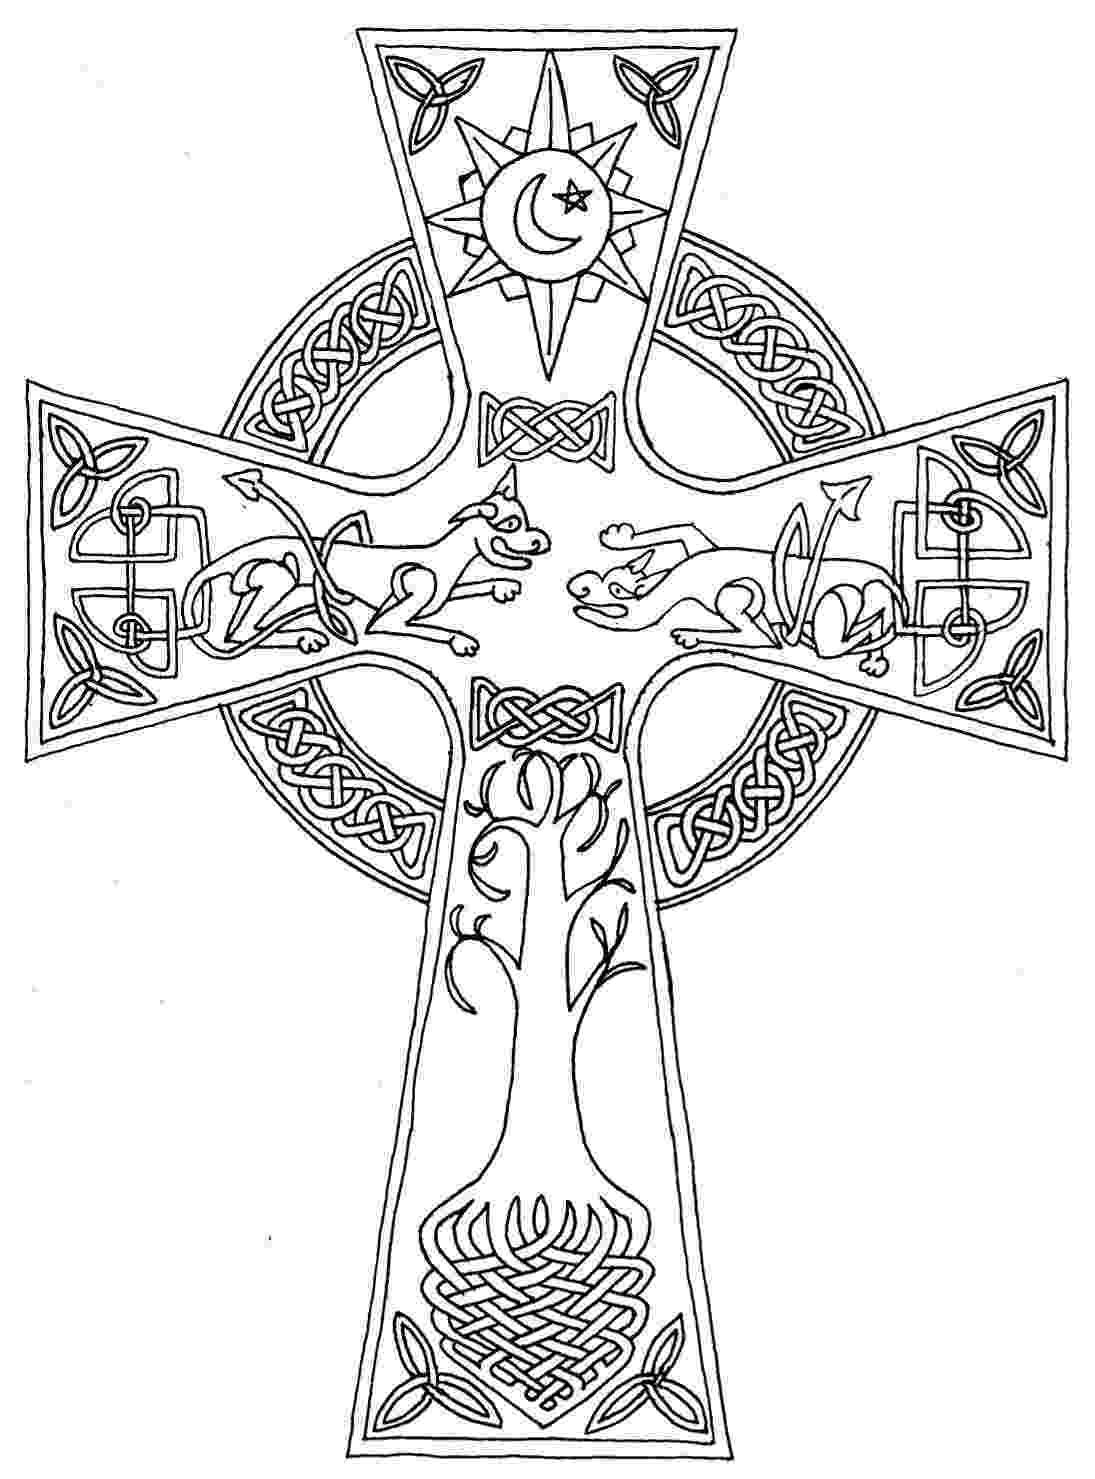 celtic coloring celtic cross by pktmerlin85 on deviantart celtic coloring